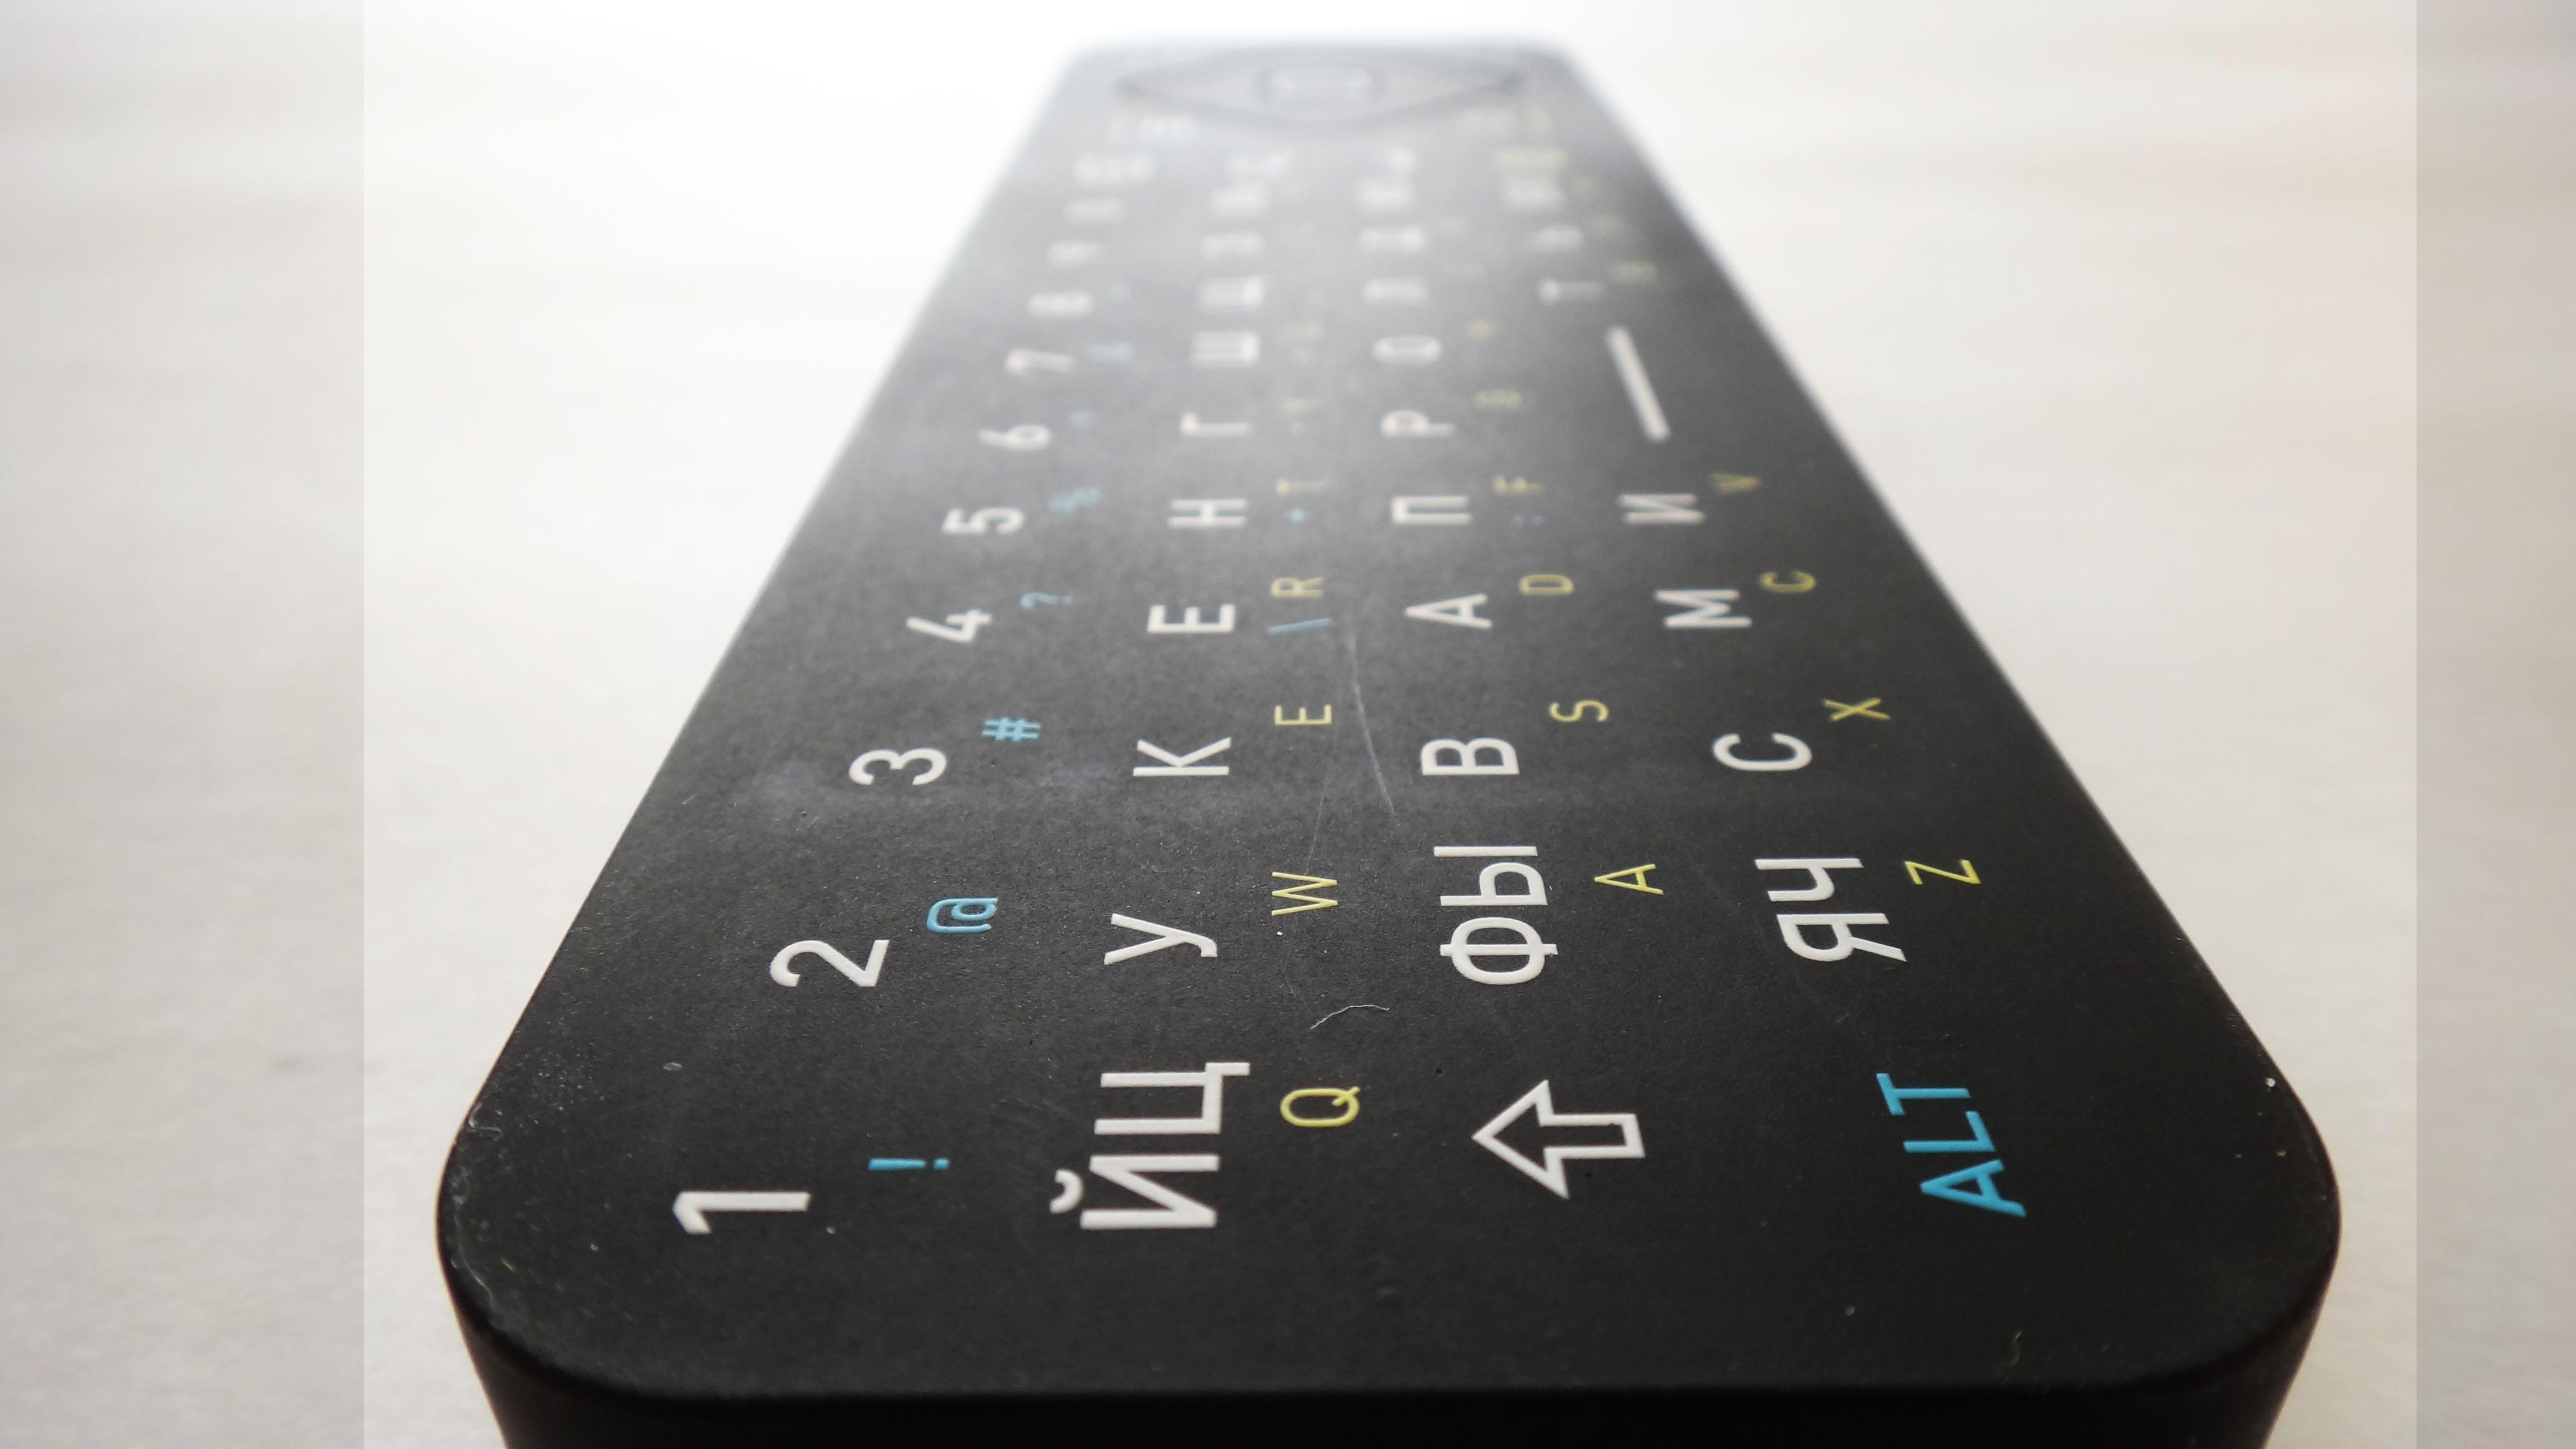 QWERTY клавиатура пульта ДУ